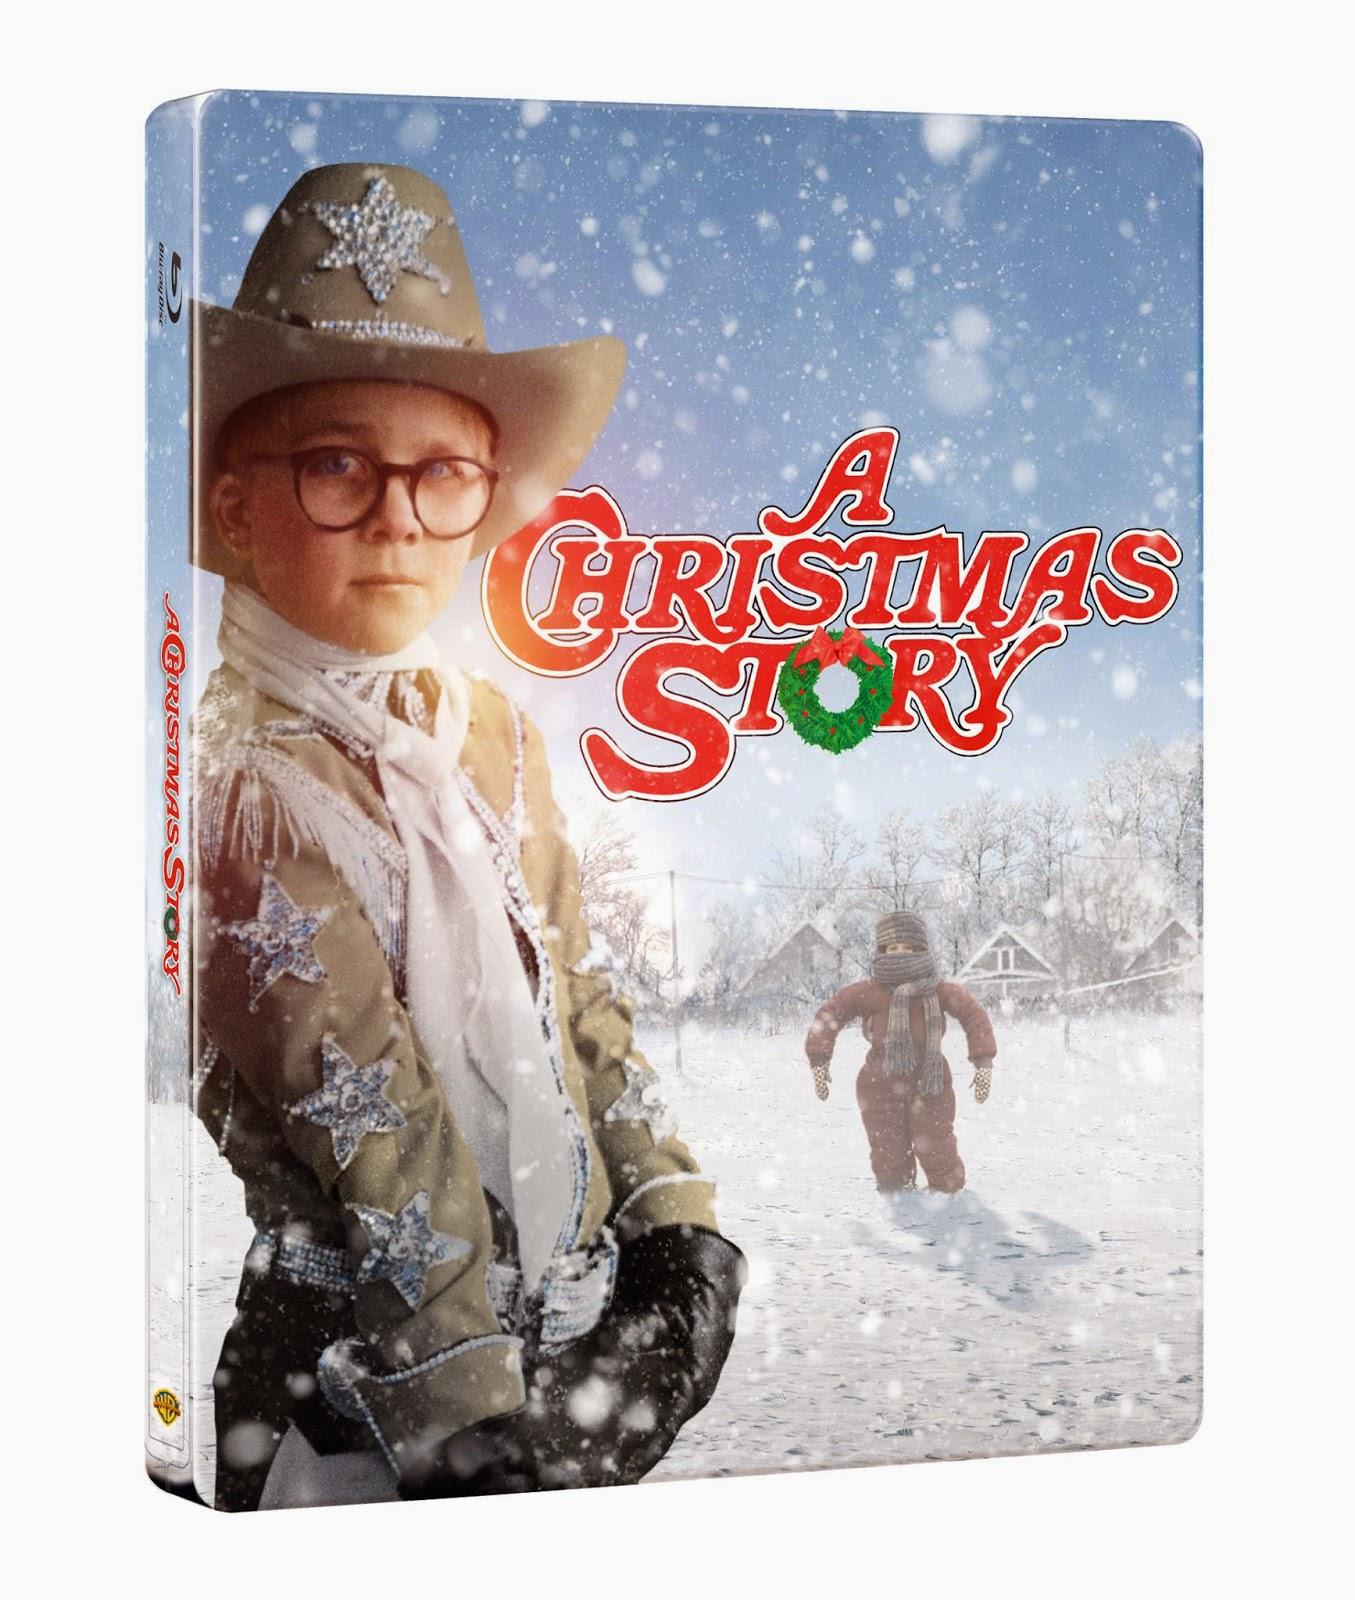 A christmas story movie pic